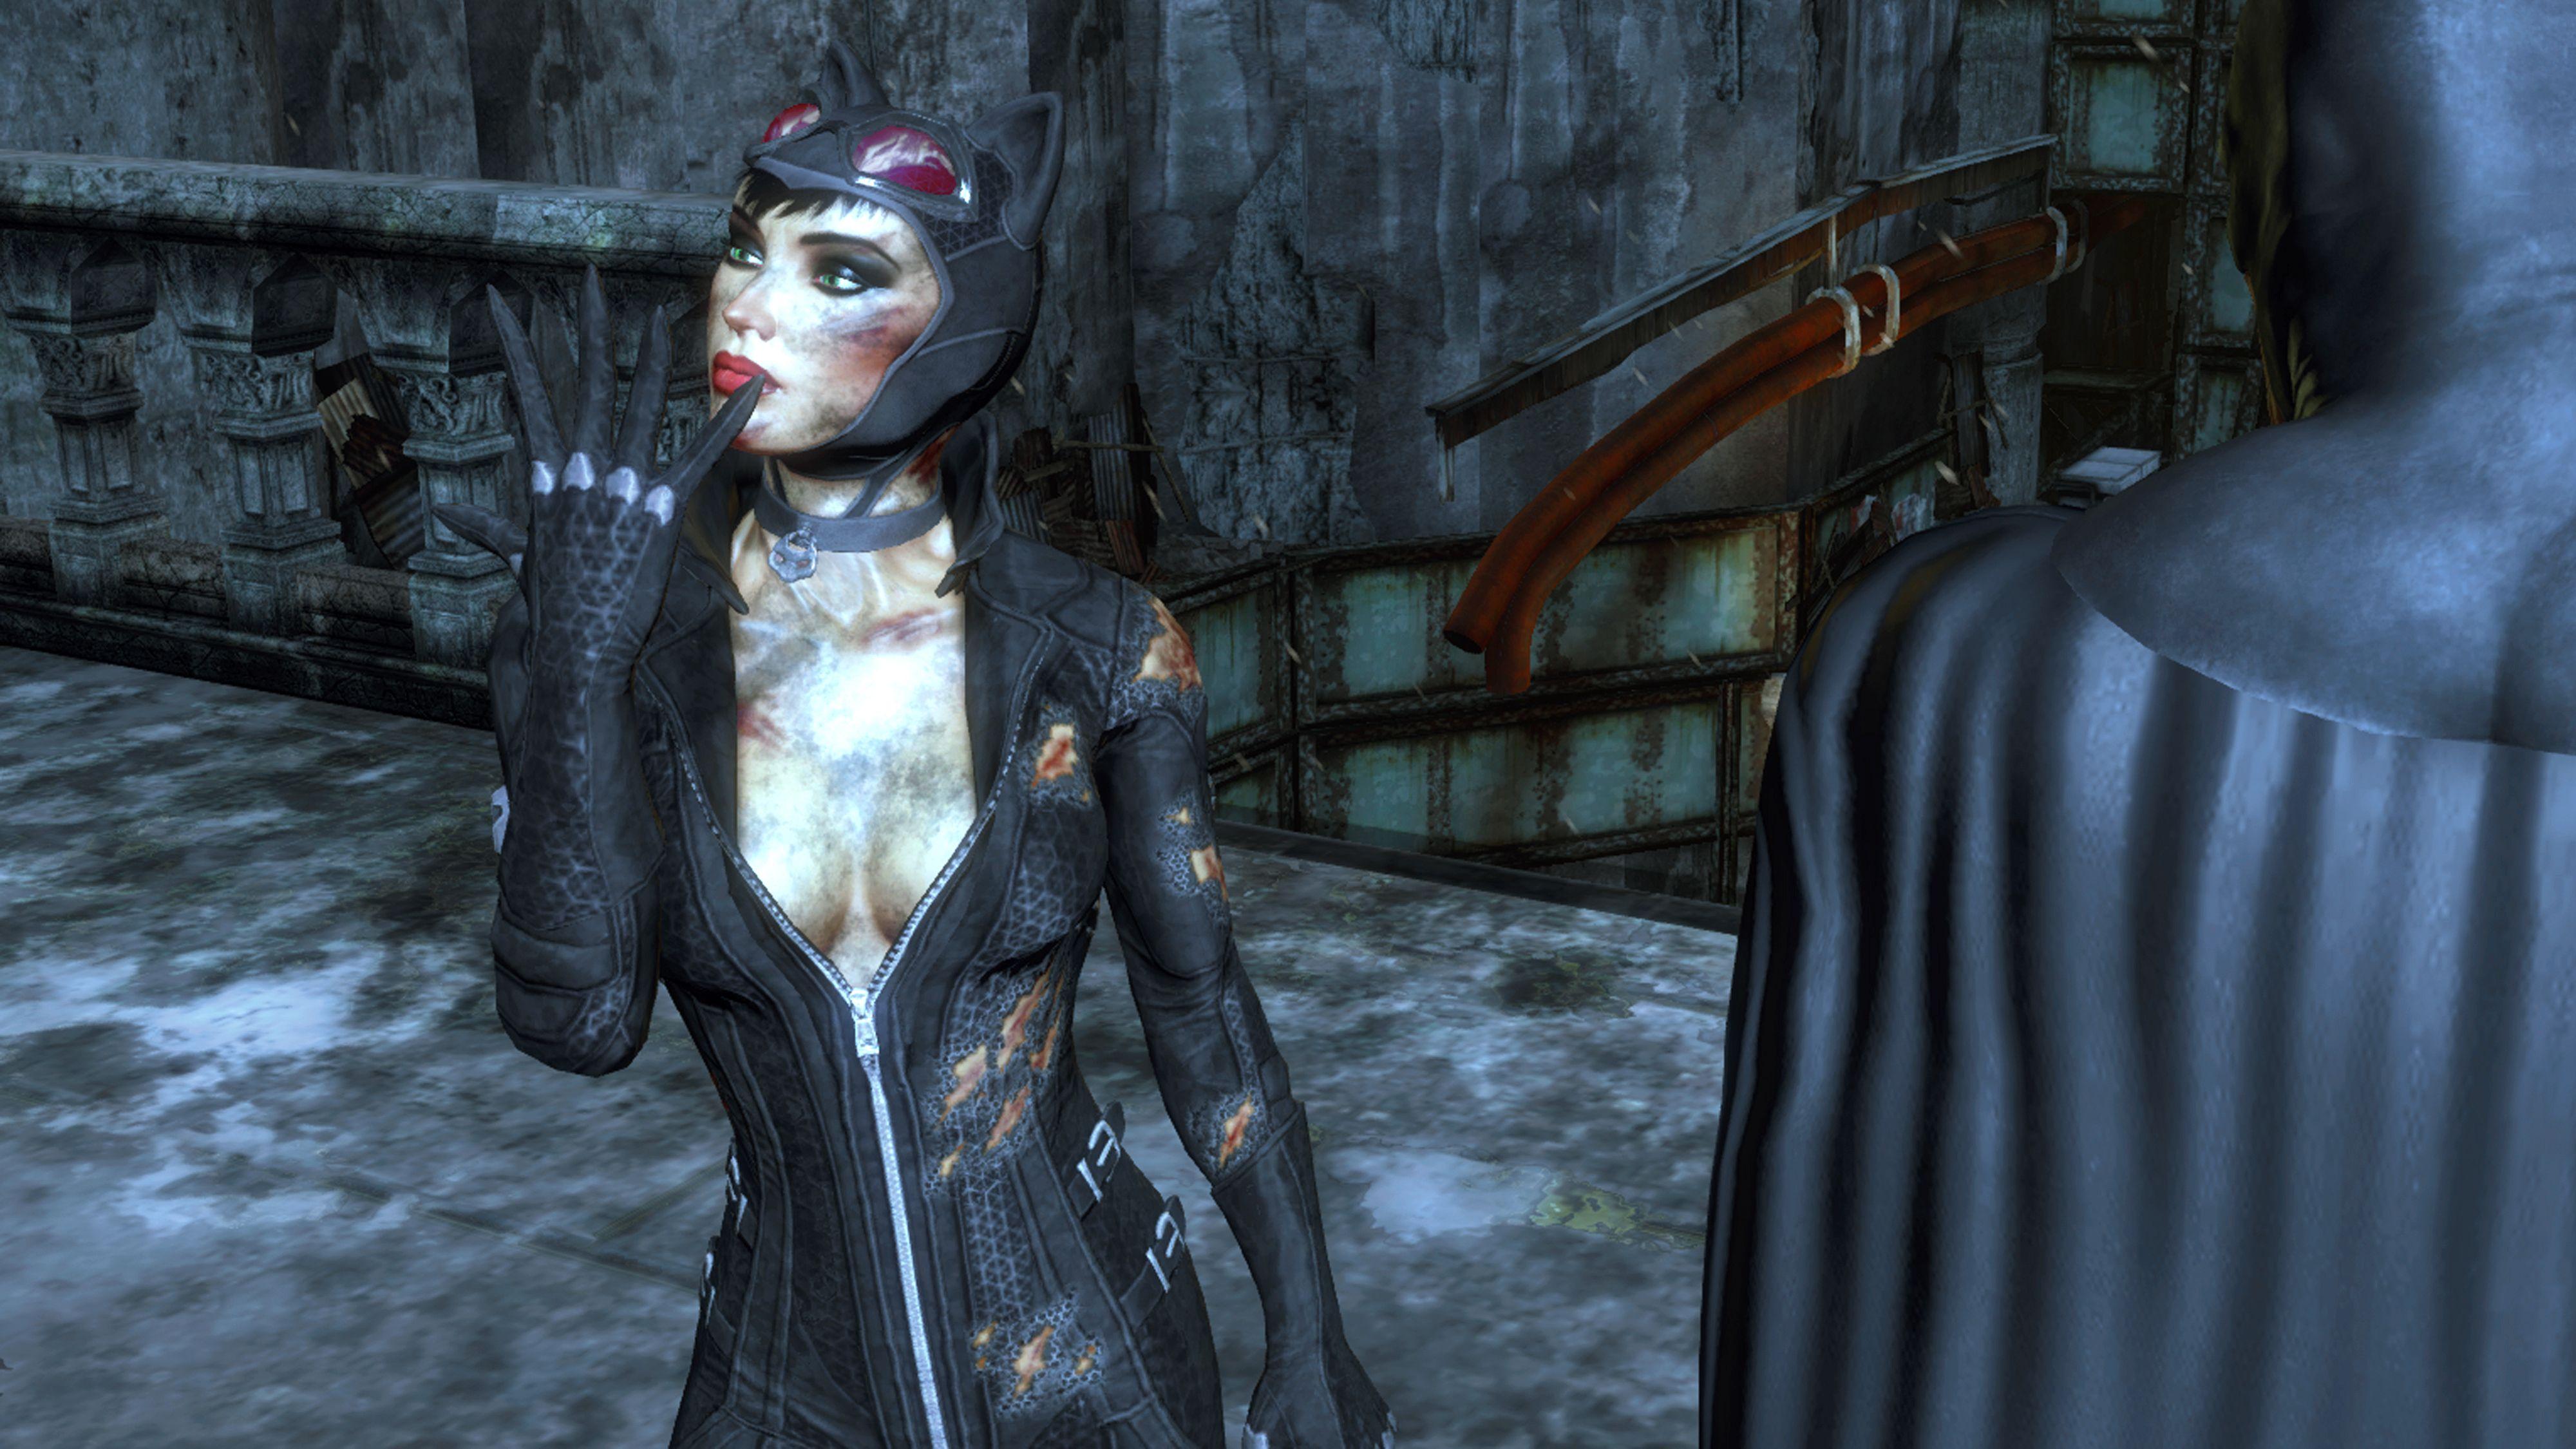 Batman Arkham City, the Catwoman epilogue, off to